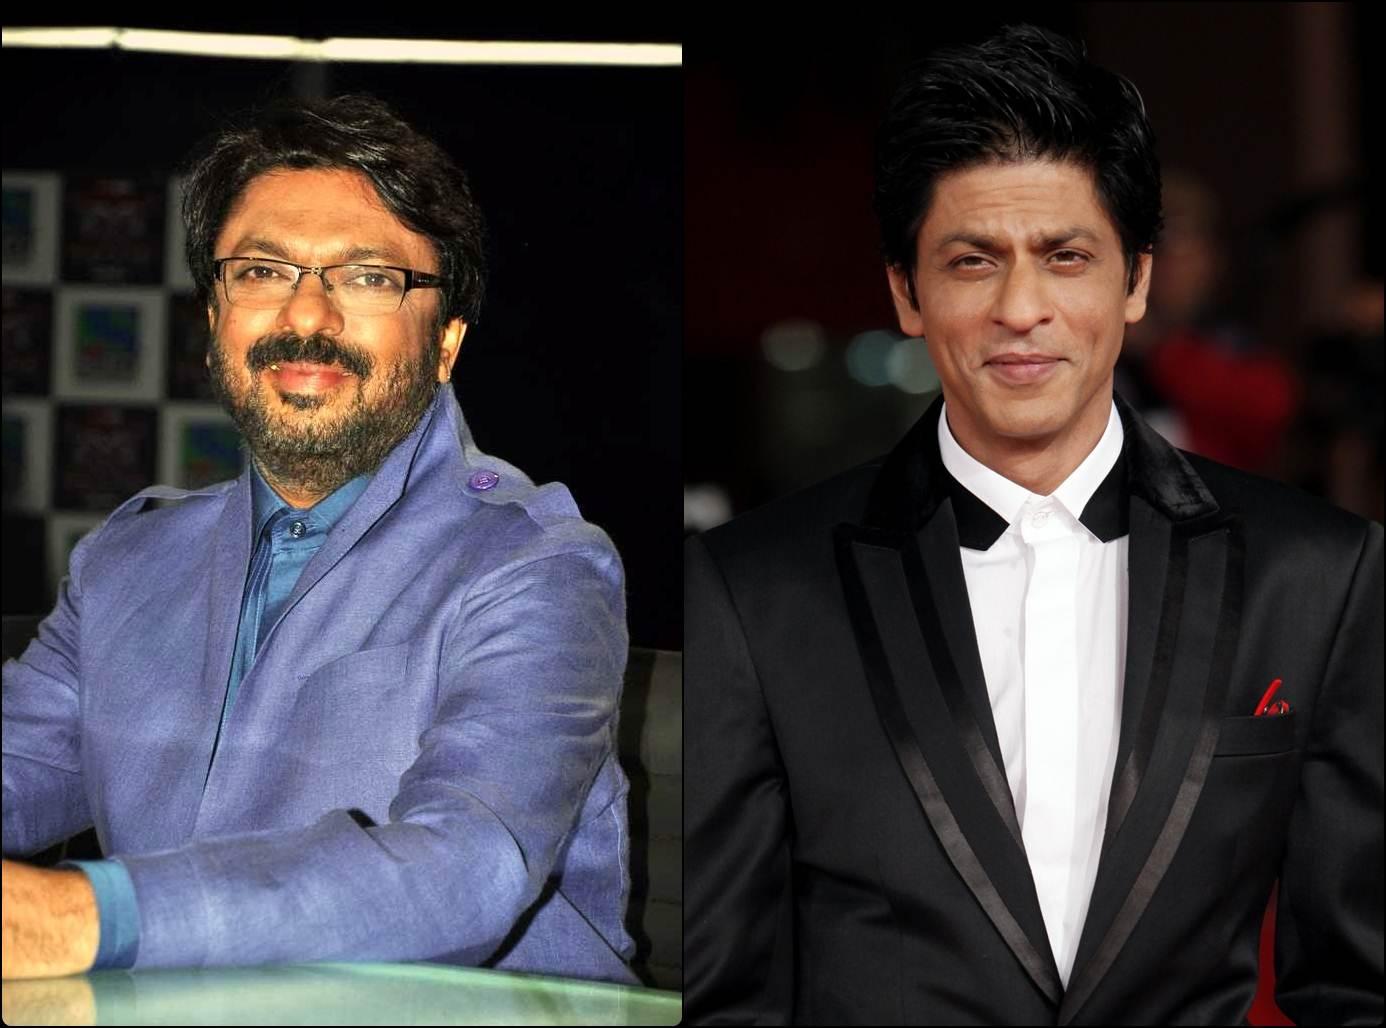 Blockbuster in the Making  Sanjay Leela Bhansali and Shah Rukh Khan to collaborate again